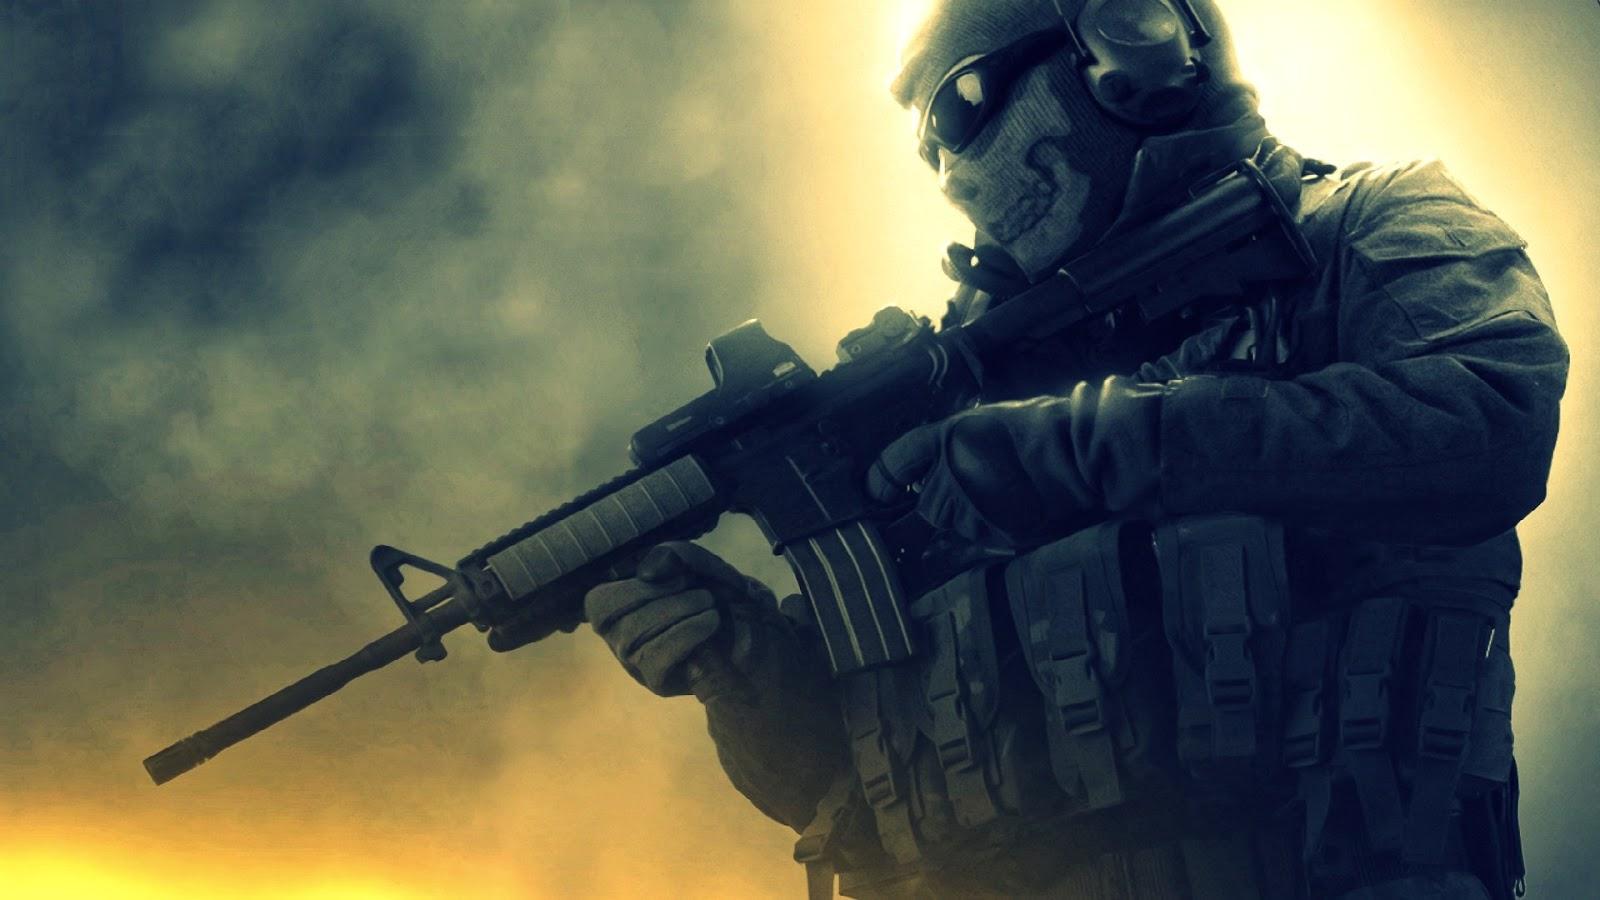 battle field army soldier hd wallpapers 1600x900